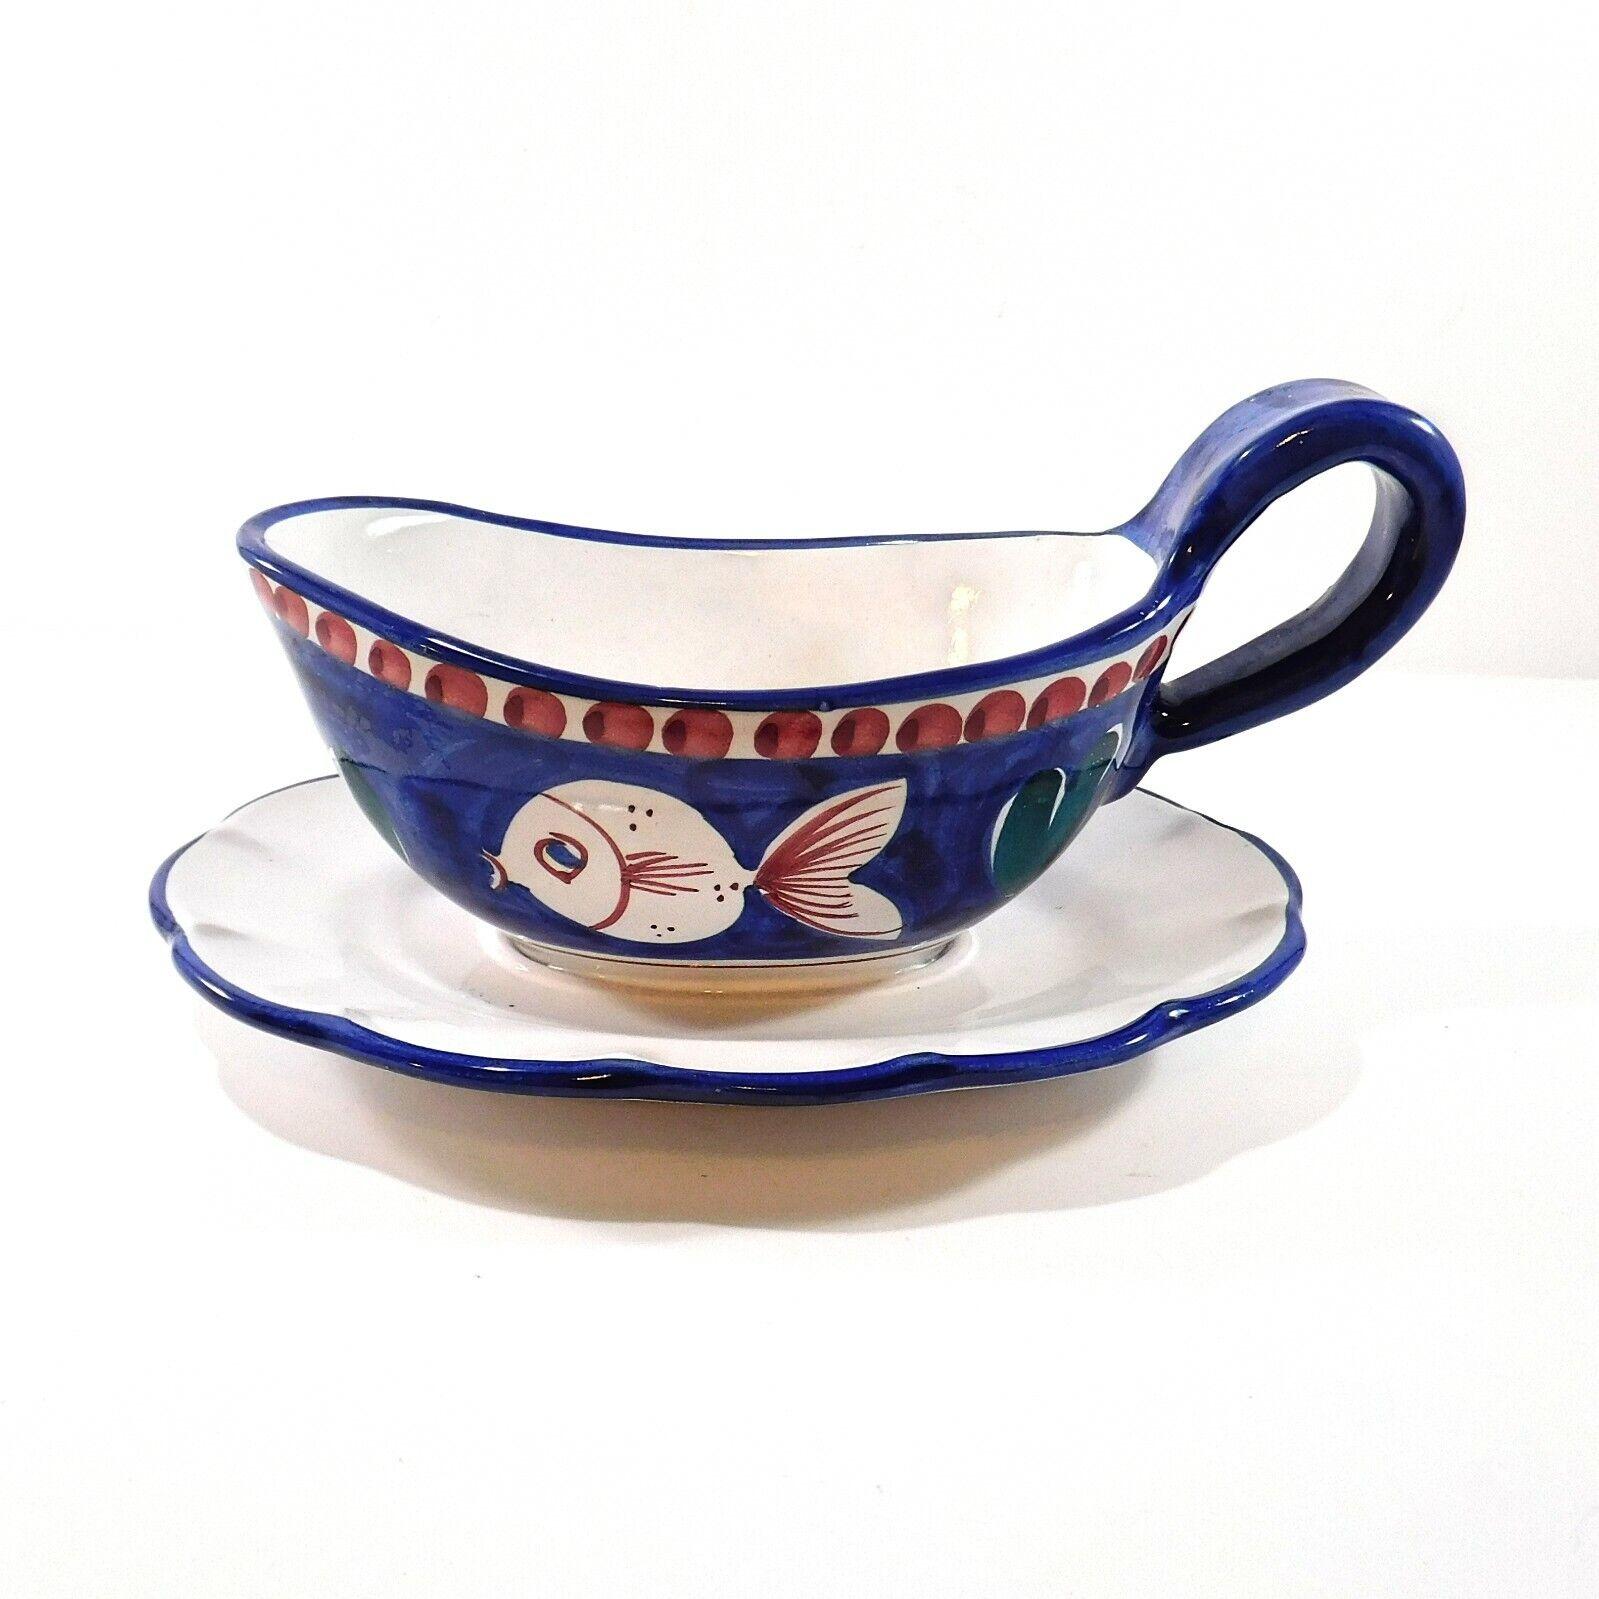 Solimene Italy Gravy Boat With Attached Underplate Fish Blue Ceramic Handmade Ebay